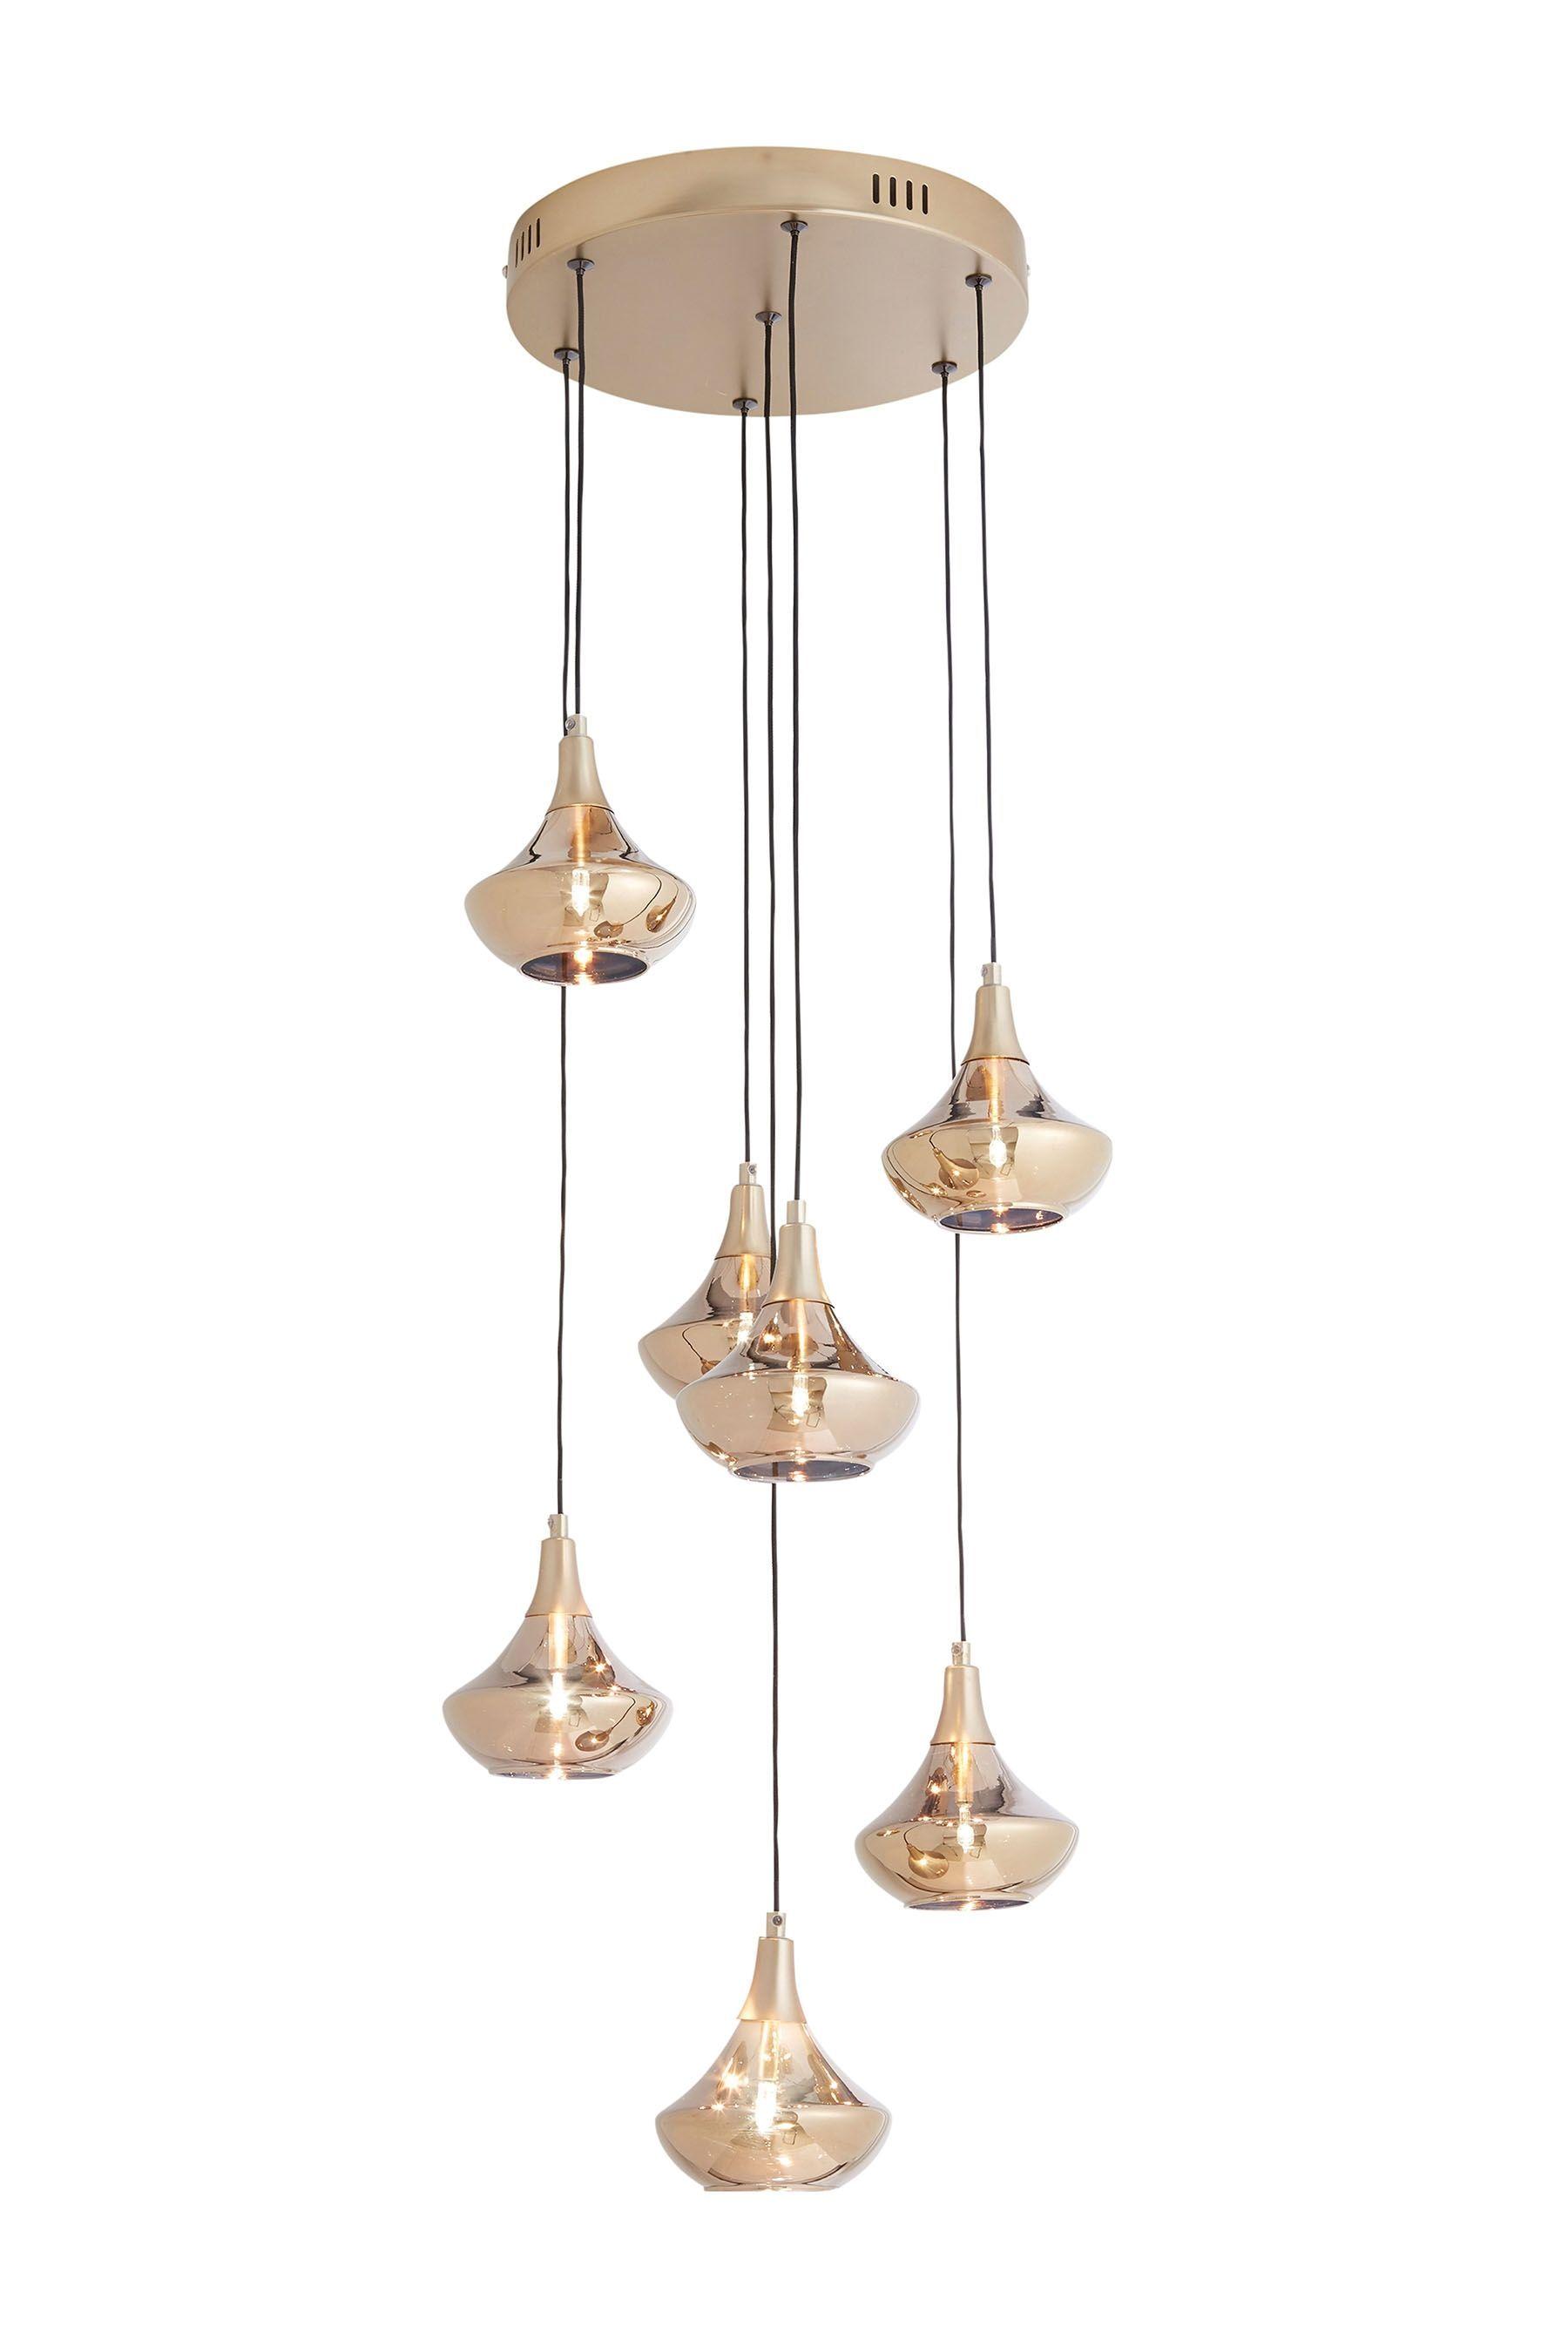 Buy Sloane 7 light Cluster Pendant online today at Next